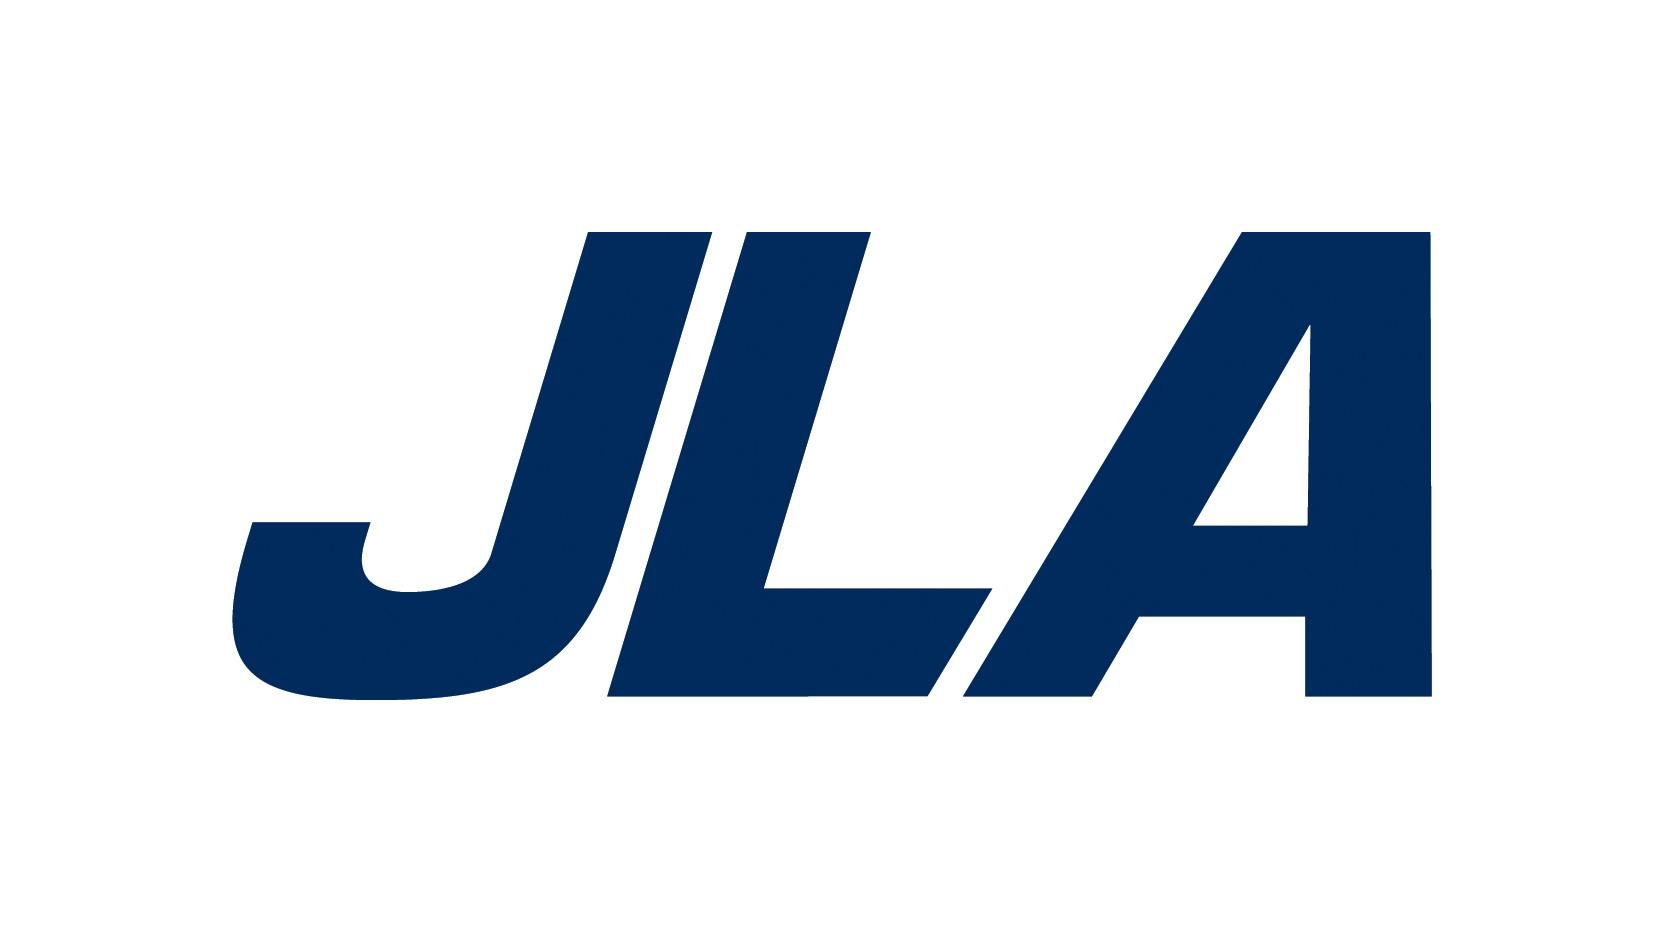 Jla Commercial Laundry Equipment Catering Equipment